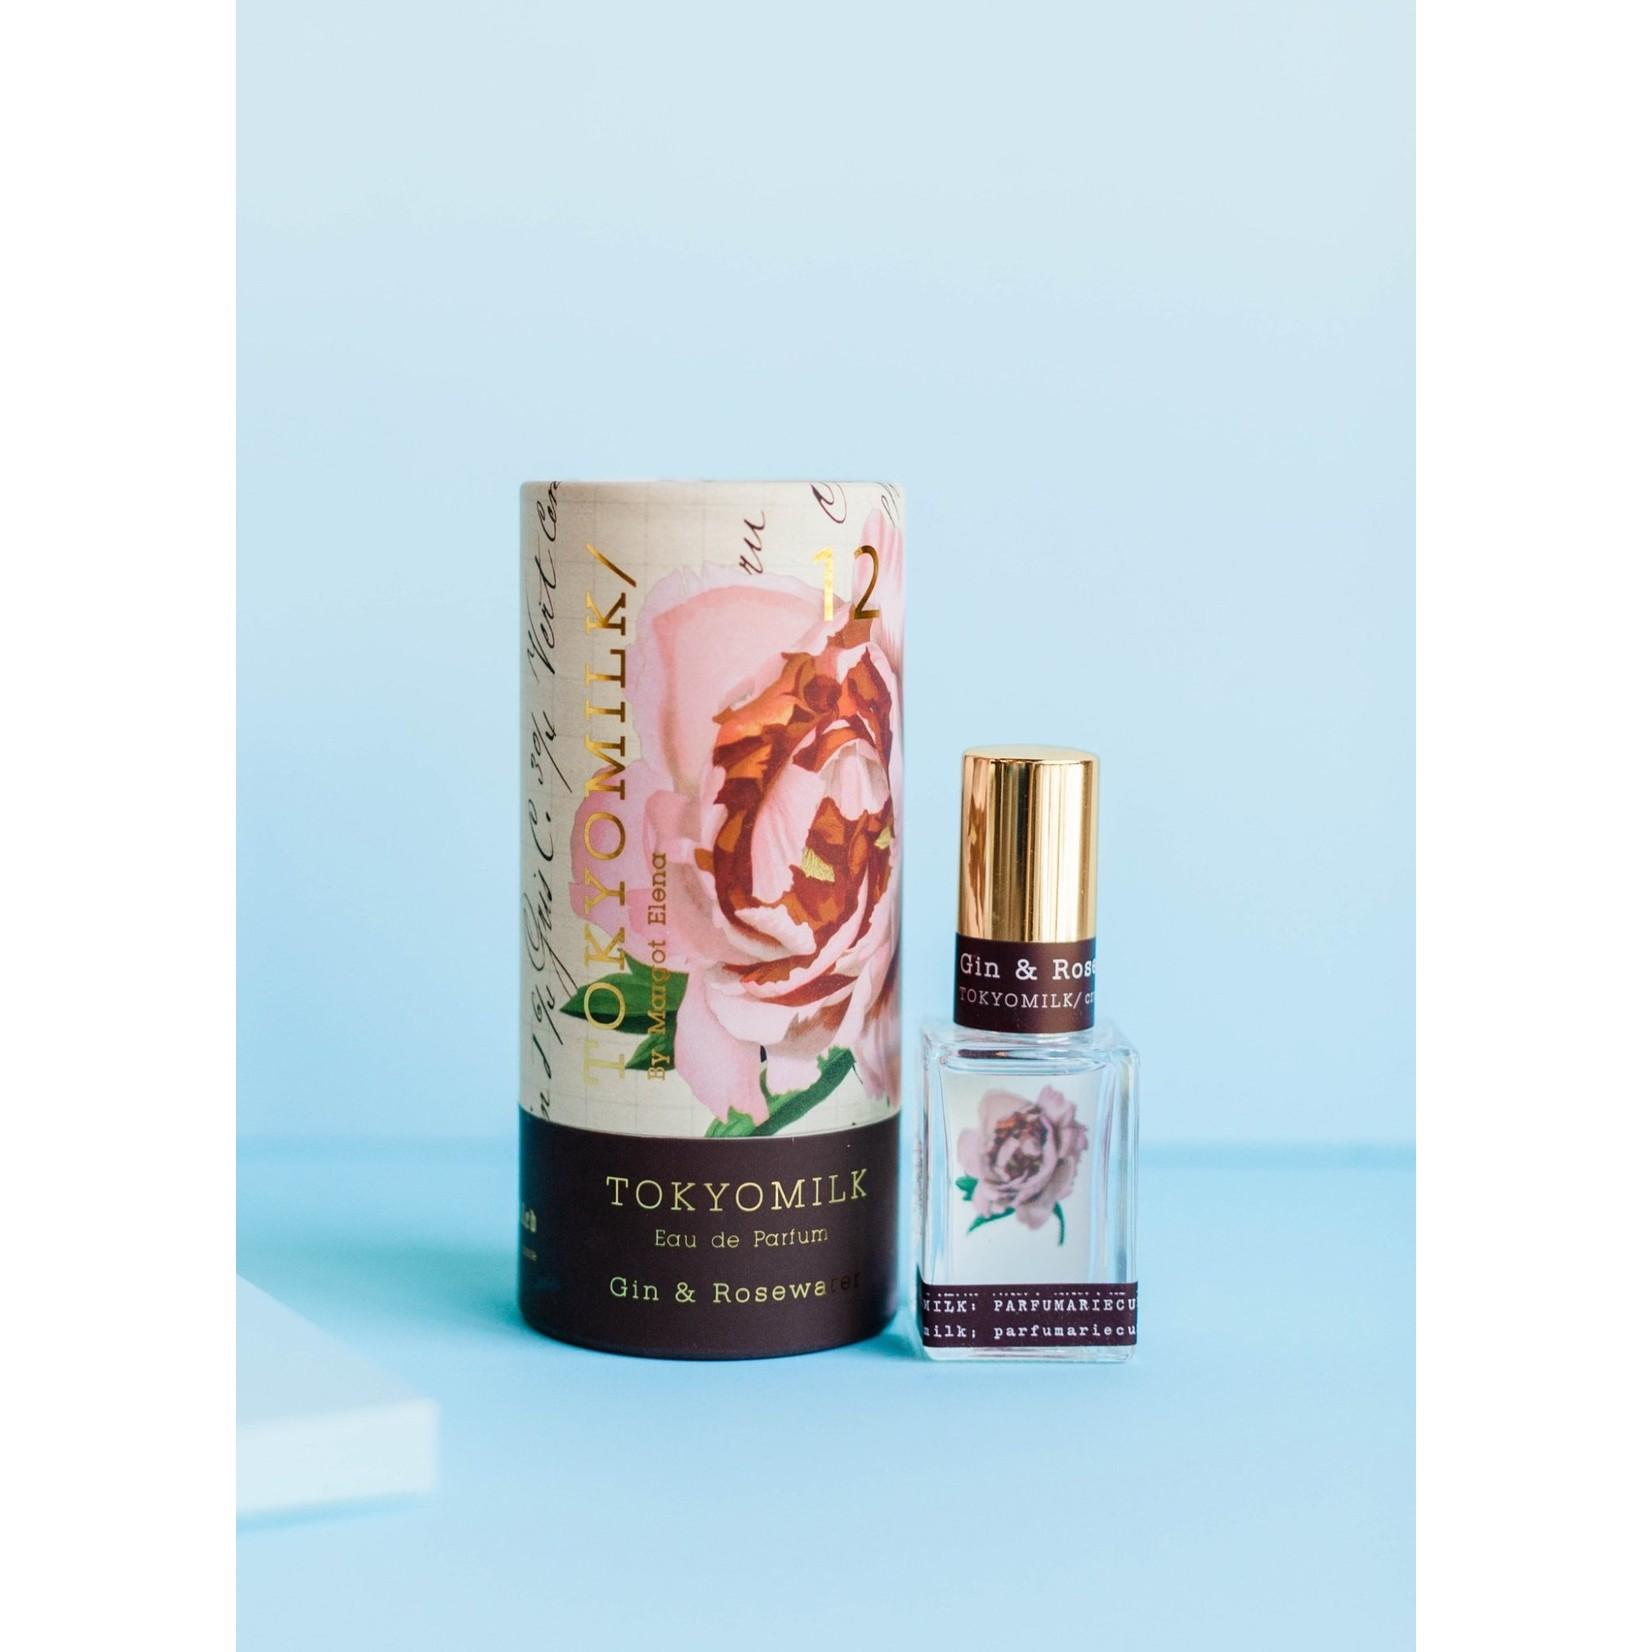 Tokyomilk Parfum Gin&Rosewater No12